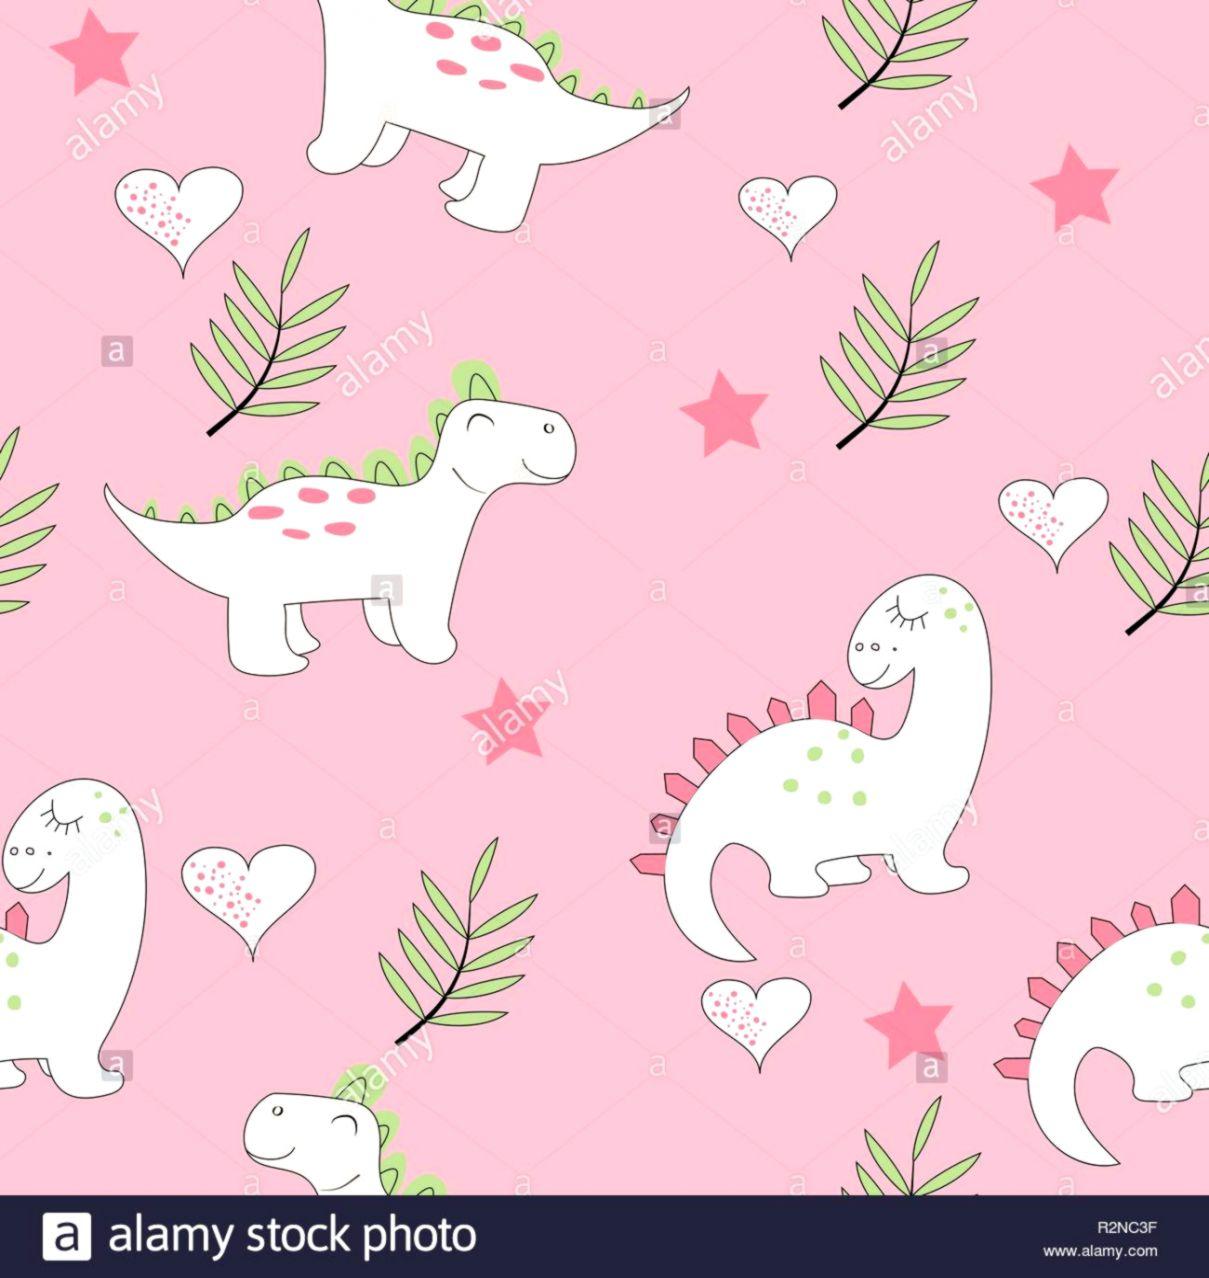 Light Pink Wallpaper Wallpapers For Fun